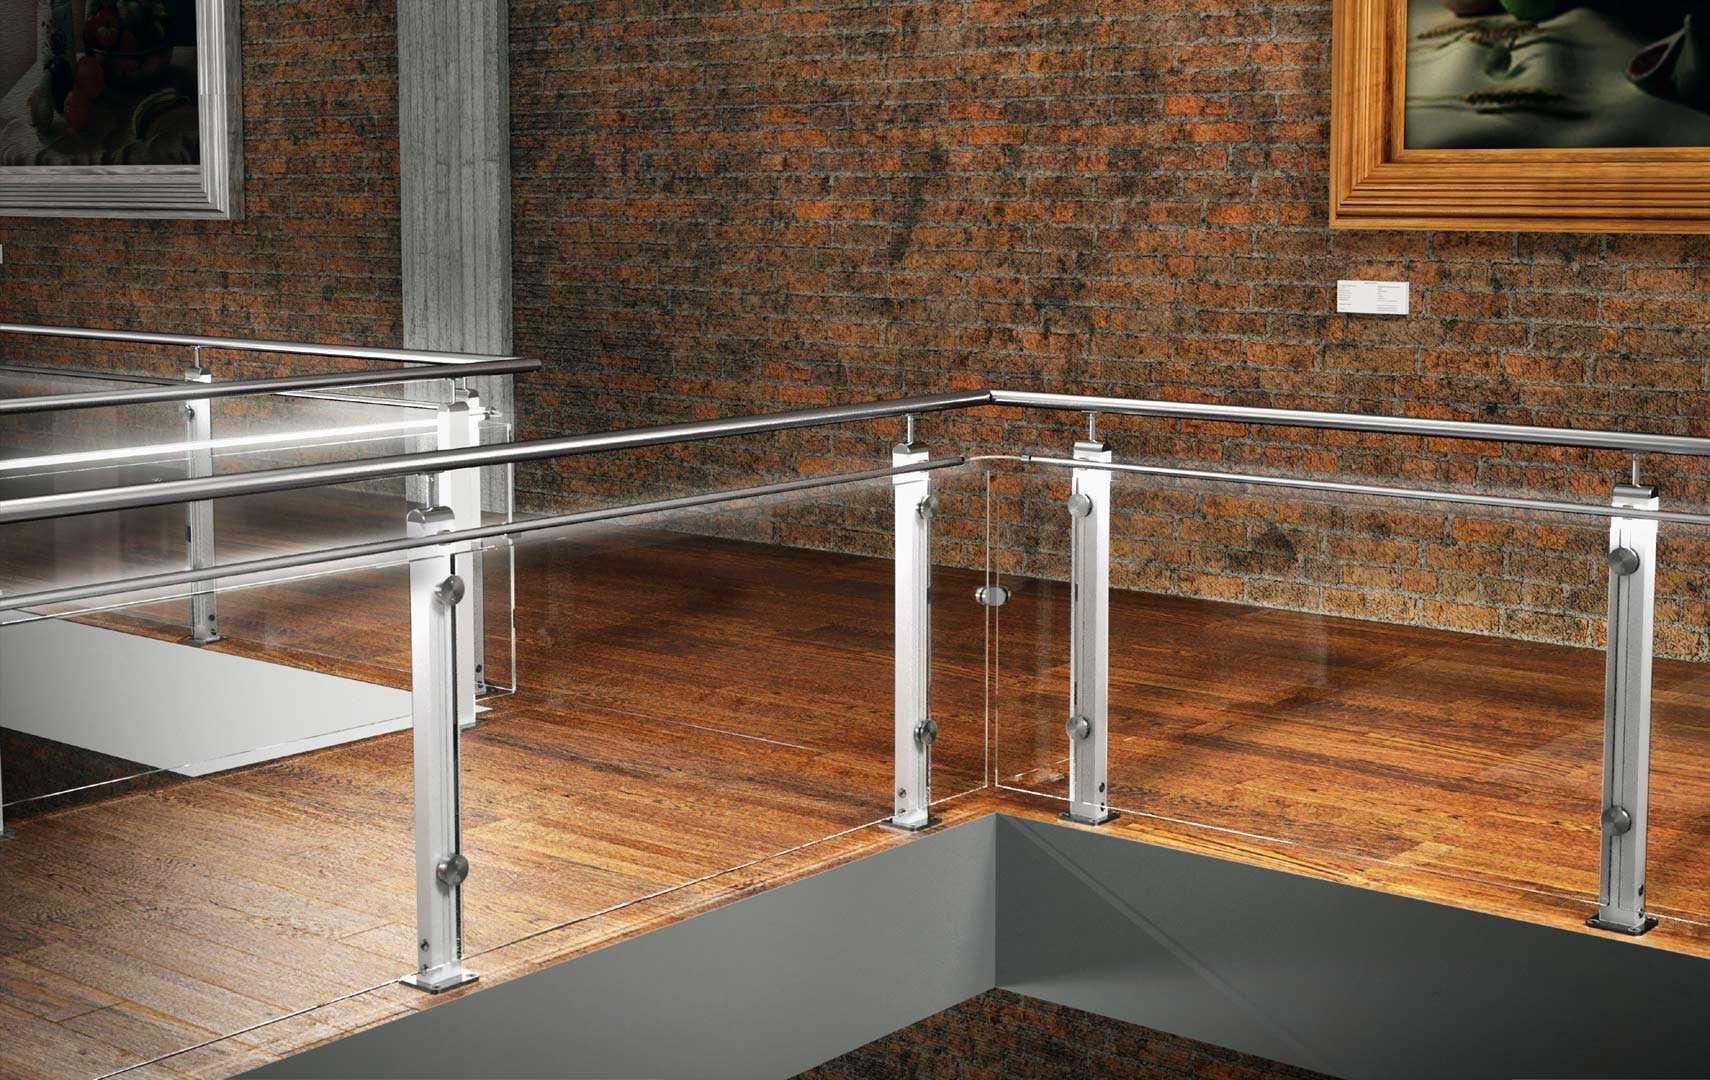 ᐅ Mast | Stair Banister, Handrails Staircases, Stairs, Staircase, Stair  Spindles, Stair Parts, Handrails, Stair Handrail, Staircase Design, The  Staircase, ...